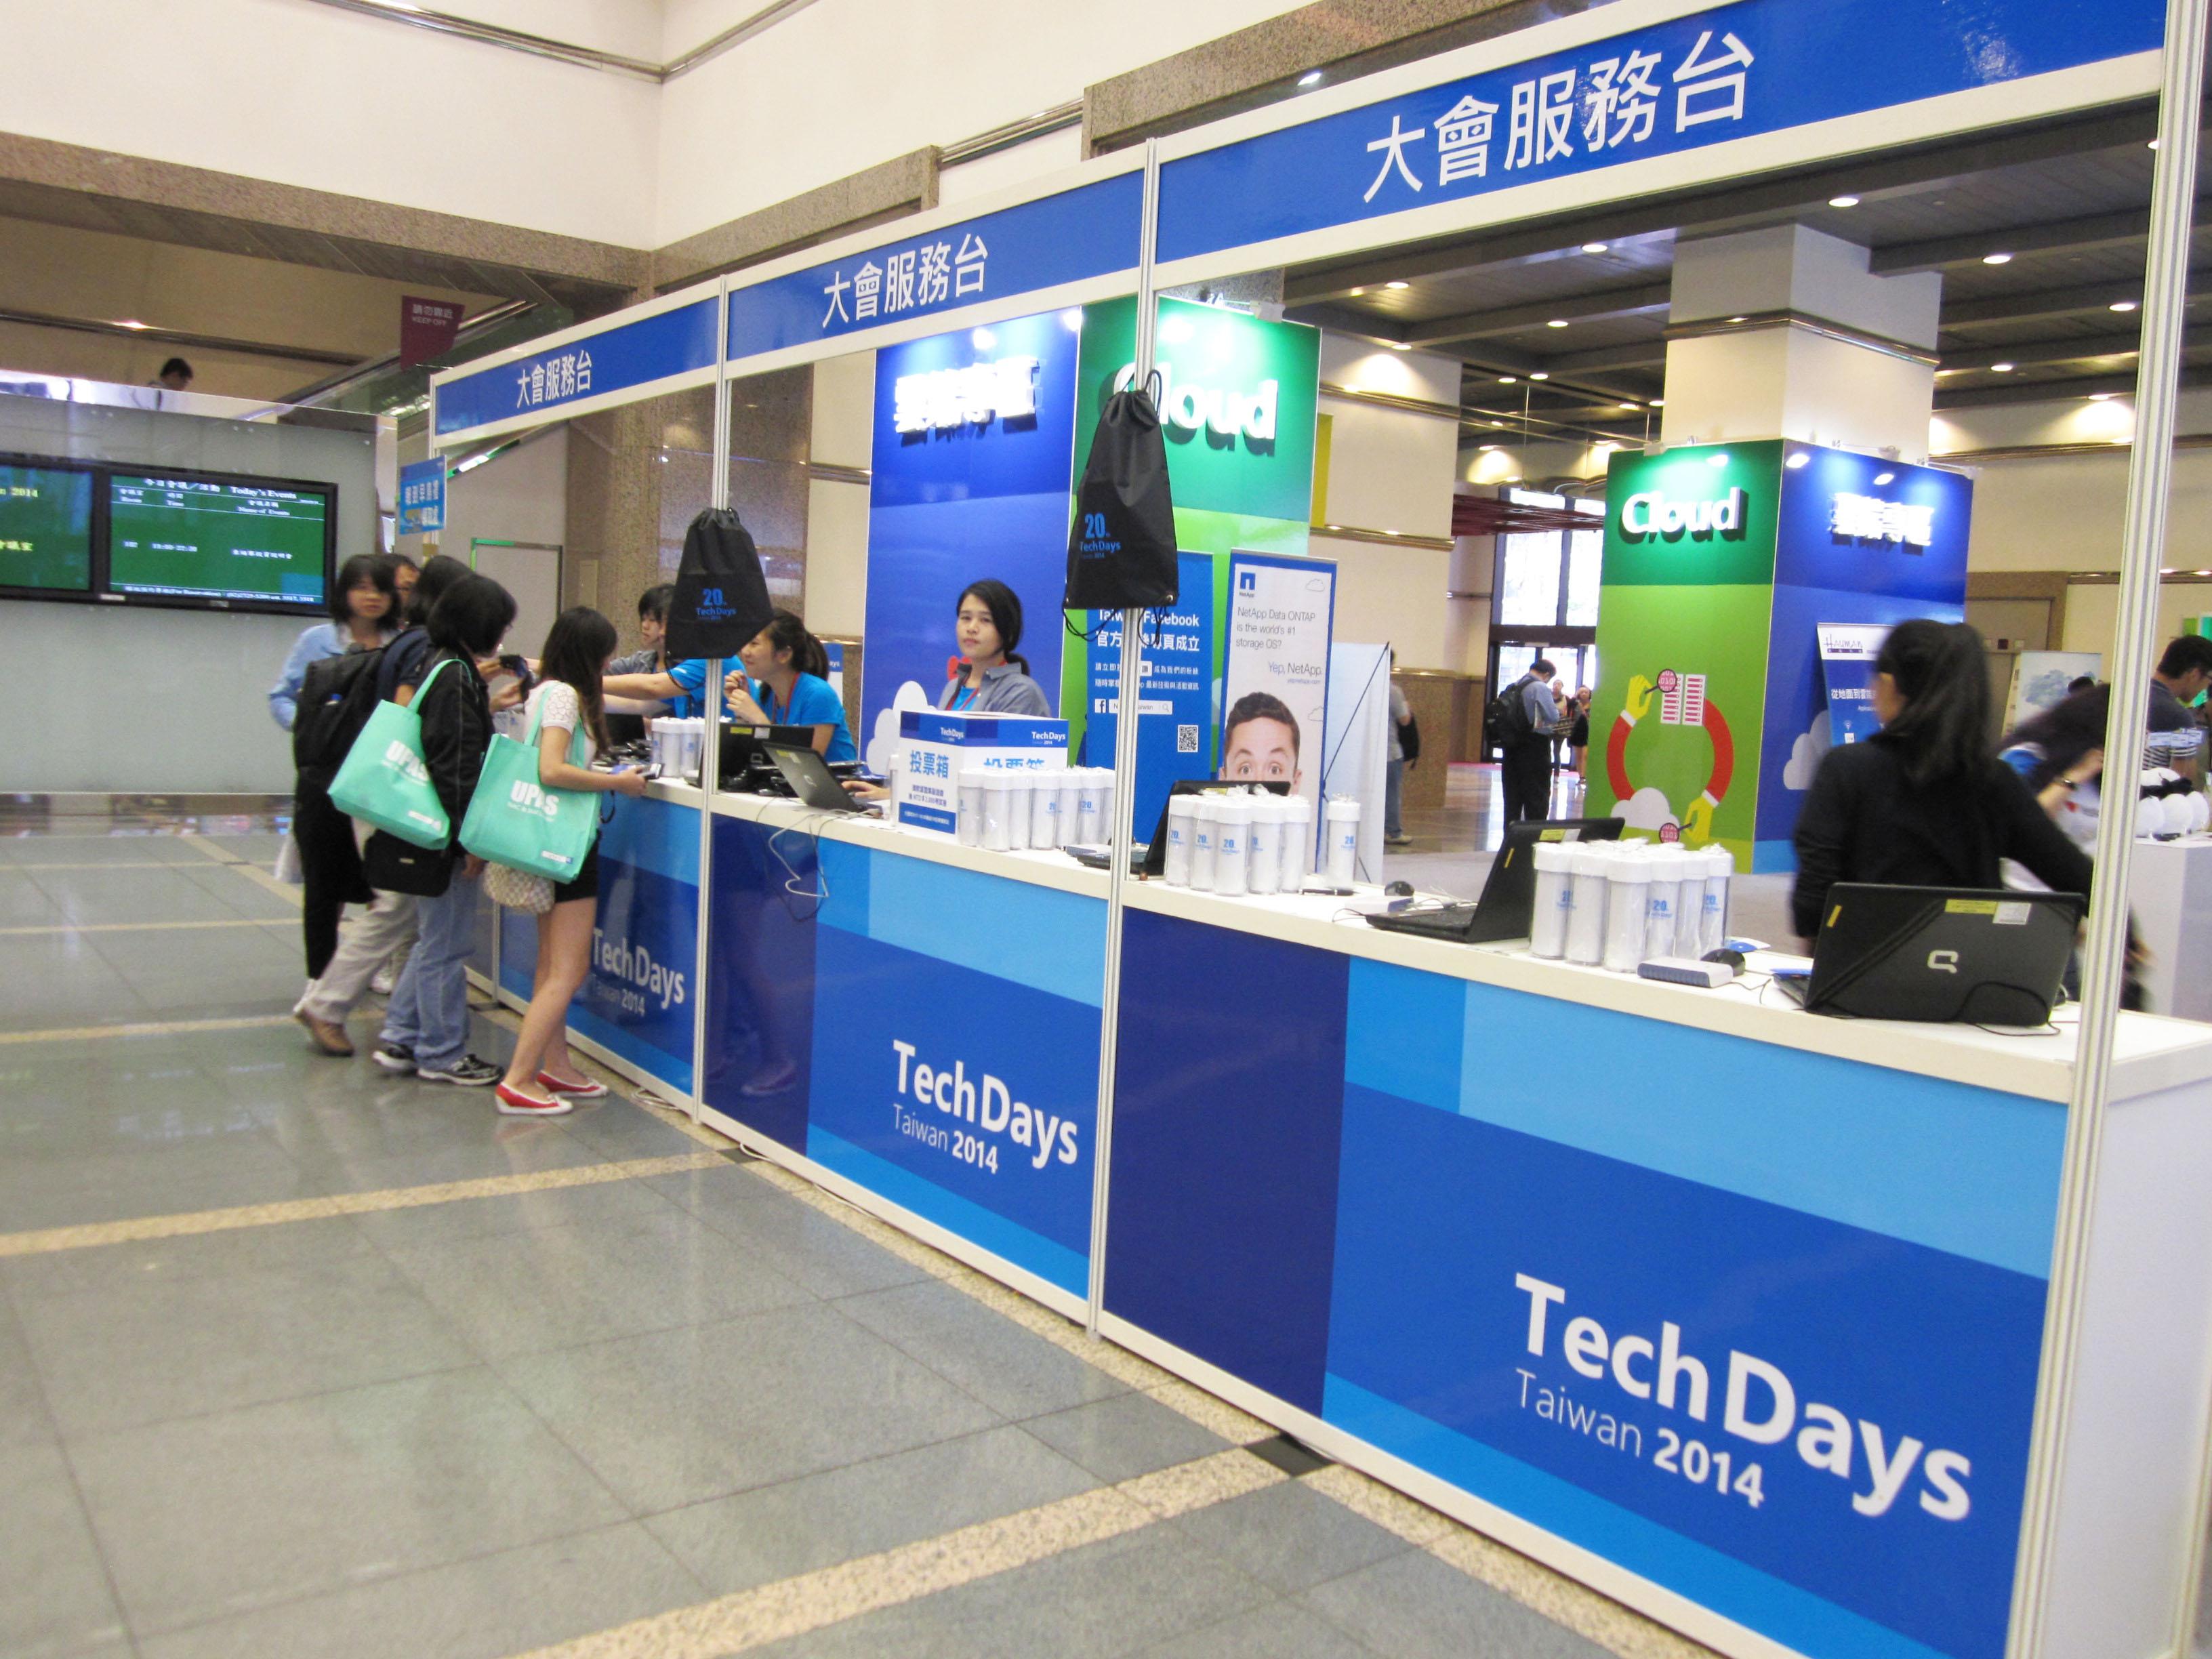 2014 Microsoft TechDays - A10-1